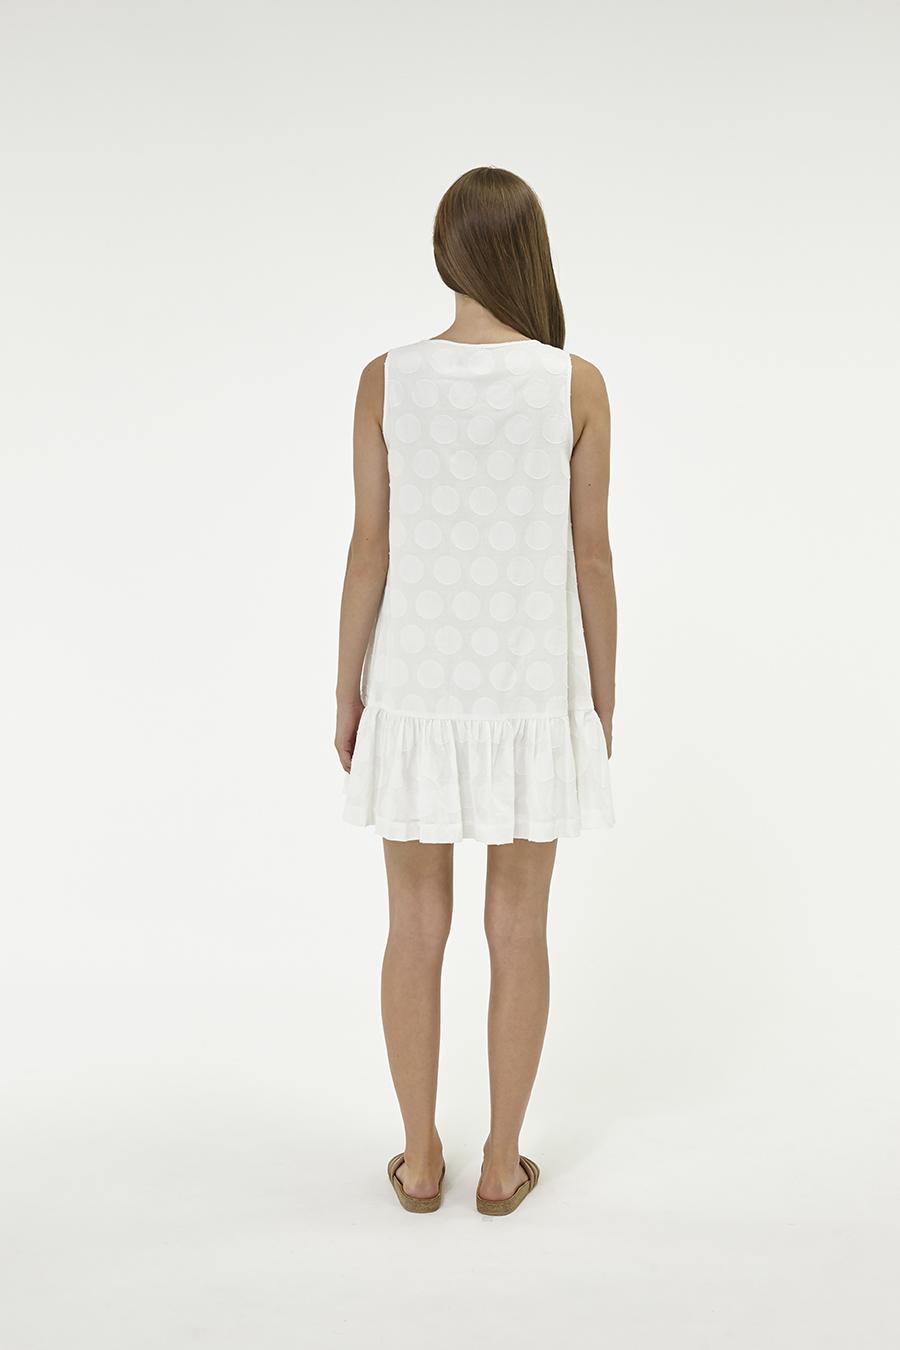 Huffer_Q3-16_W-Spot-Port-Dress_White-03